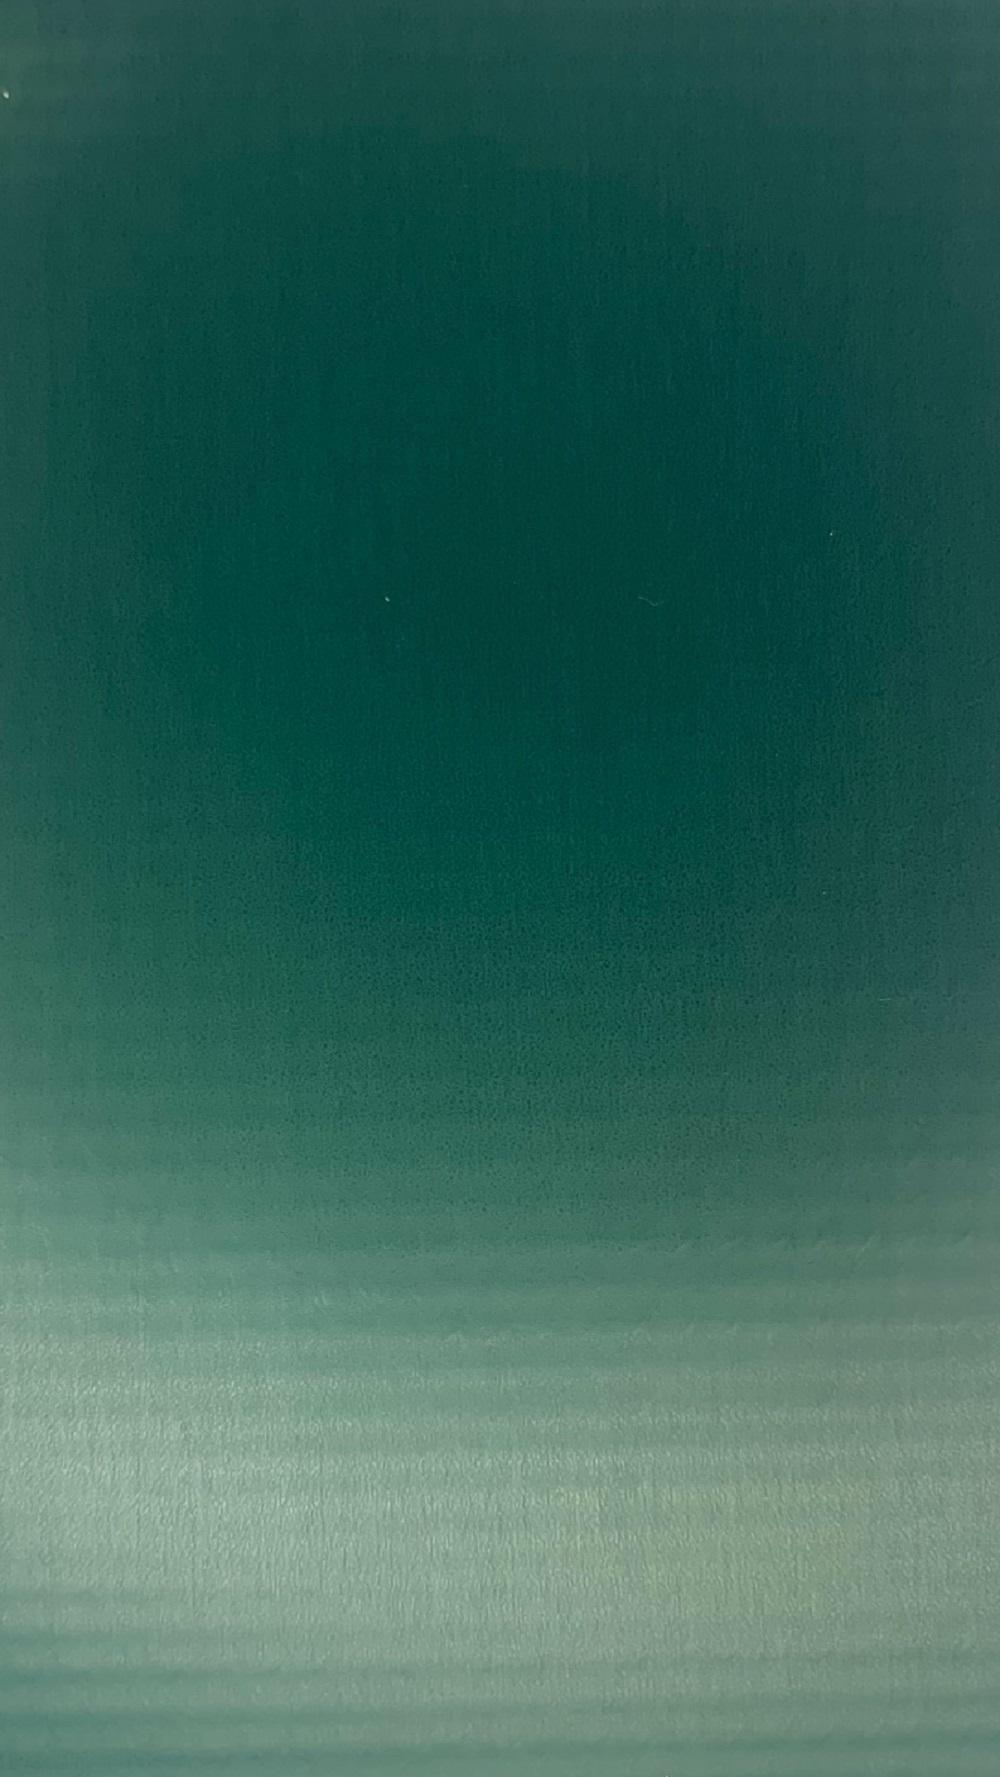 Lona Vinilona Df Fosca Verde S-218 1,45mt X 1,0mt